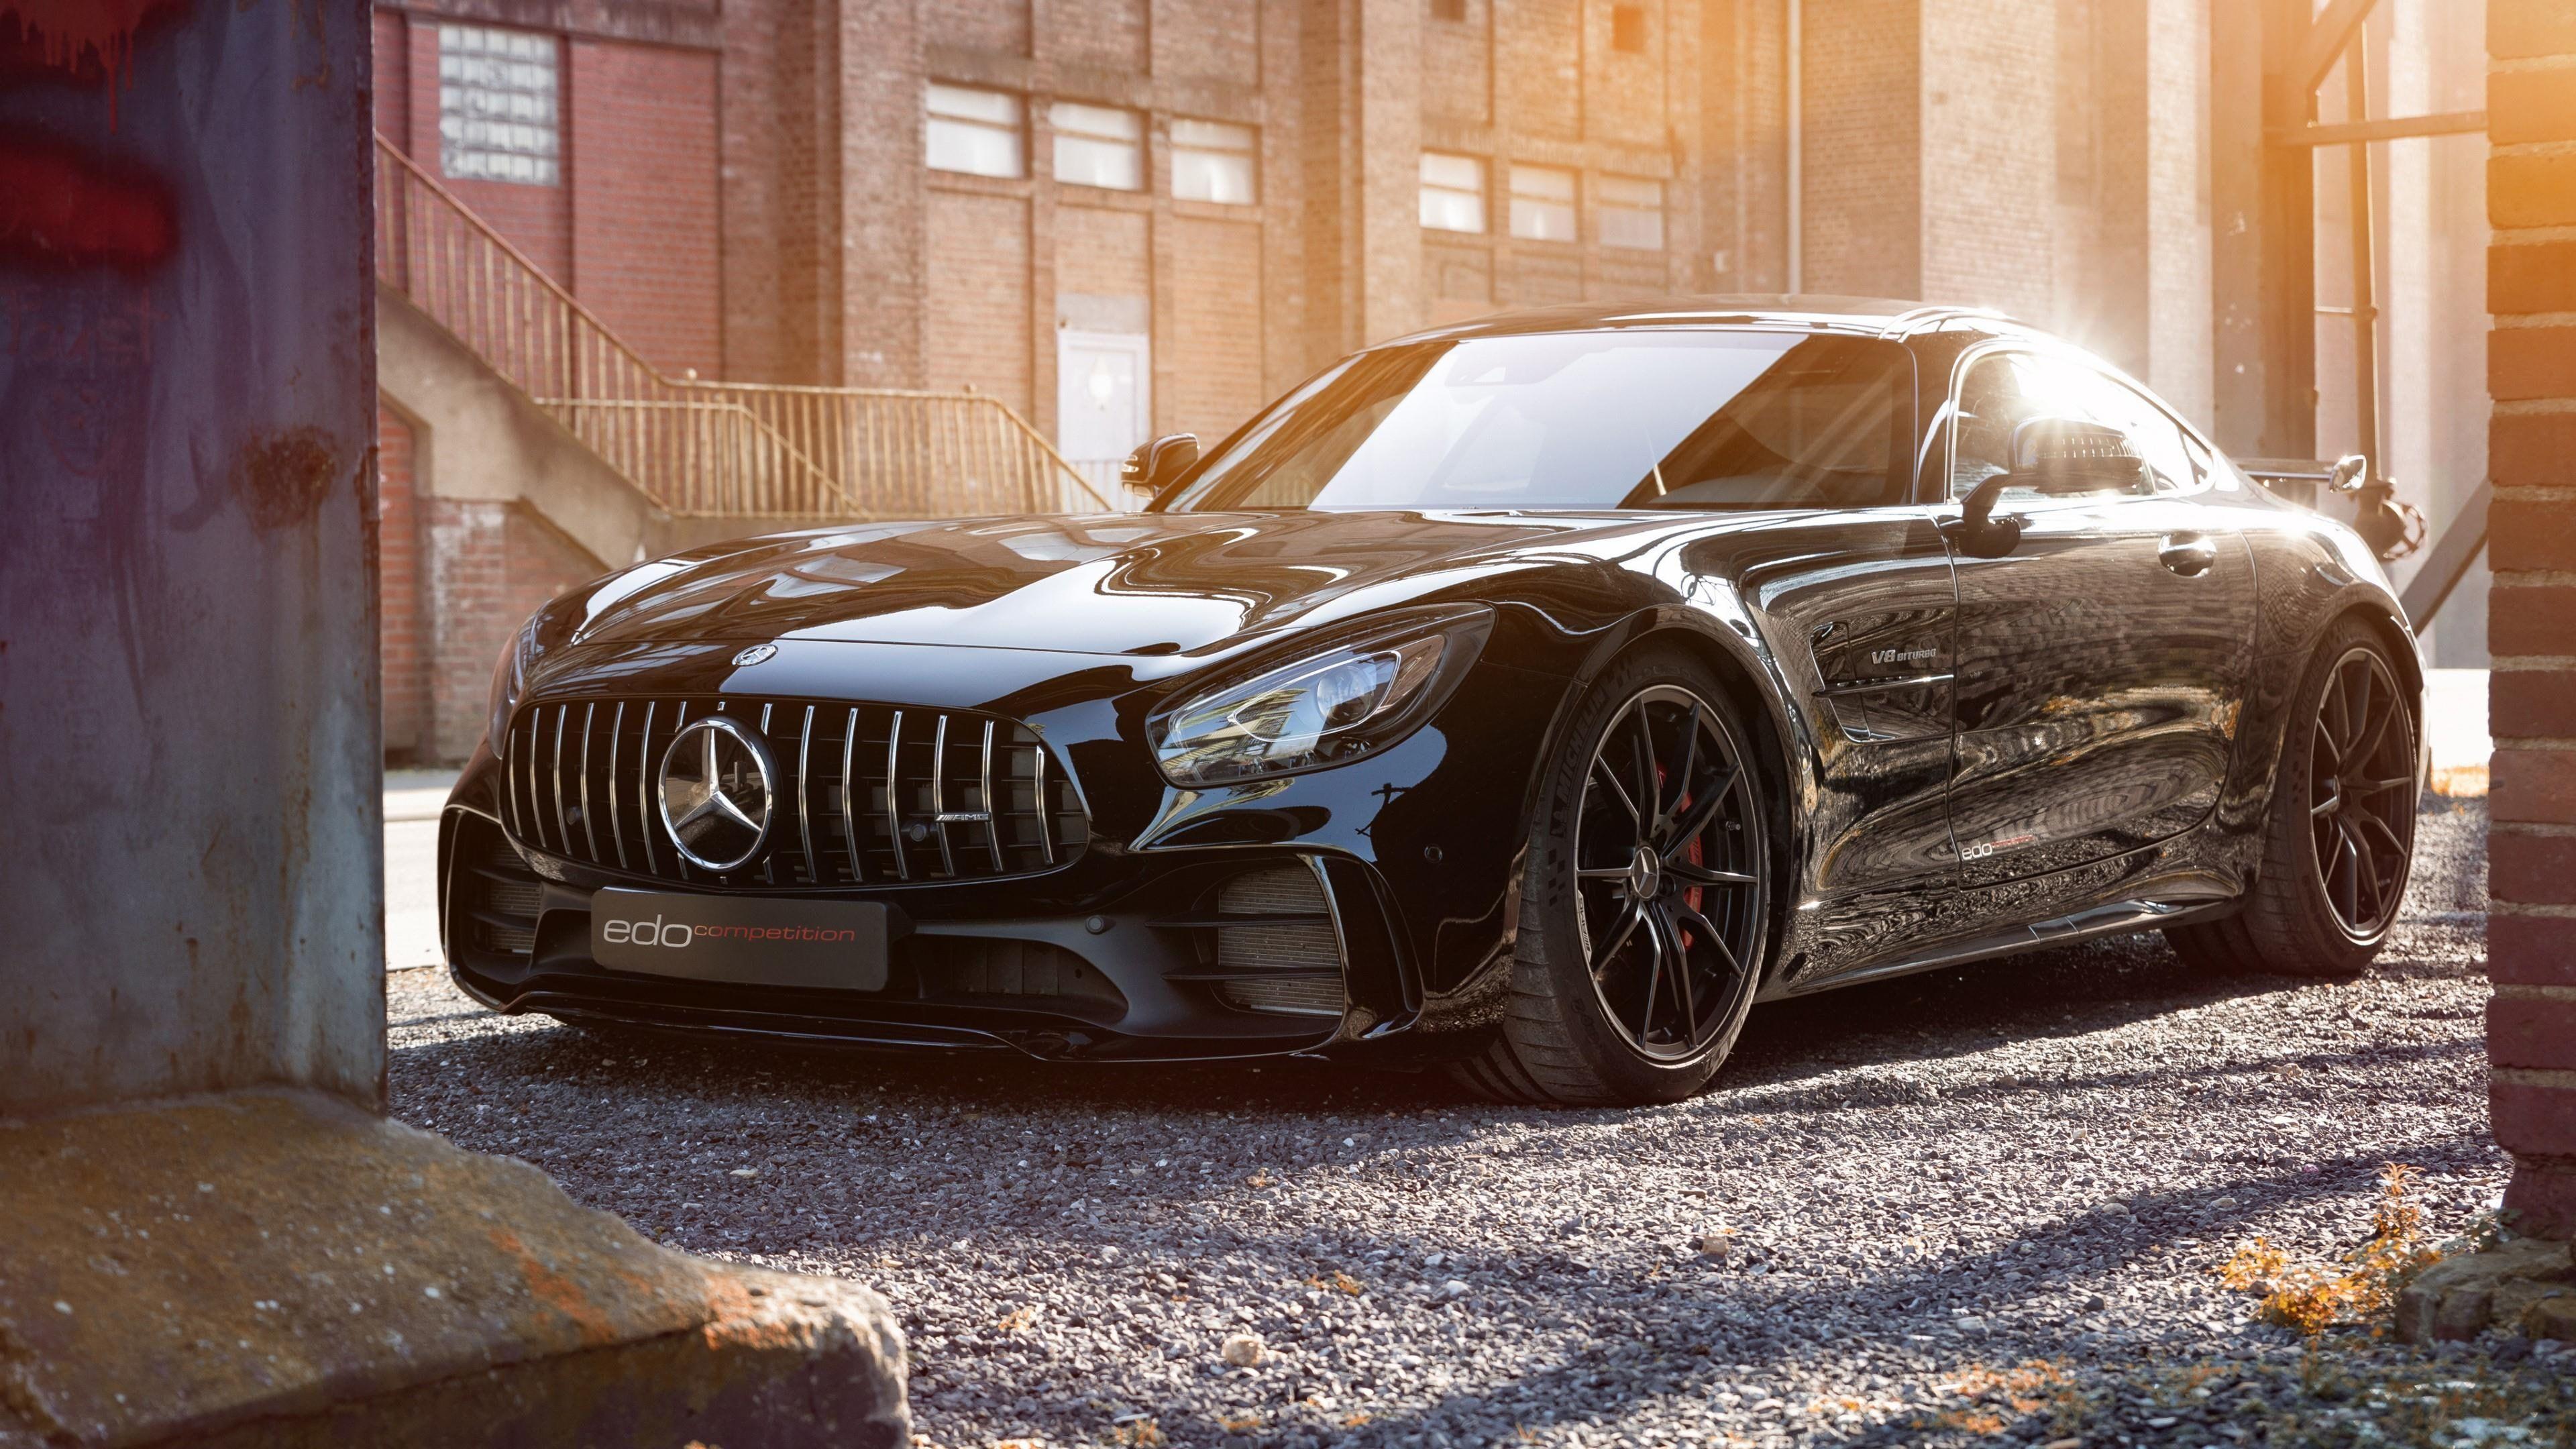 Wallpaper Black Car Mercedes Benz Luxury Vehicle Supercar Rim Sports Car In 2020 Mercedes Amg Gt R Mercedes Amg Mercedes Benz Wallpaper